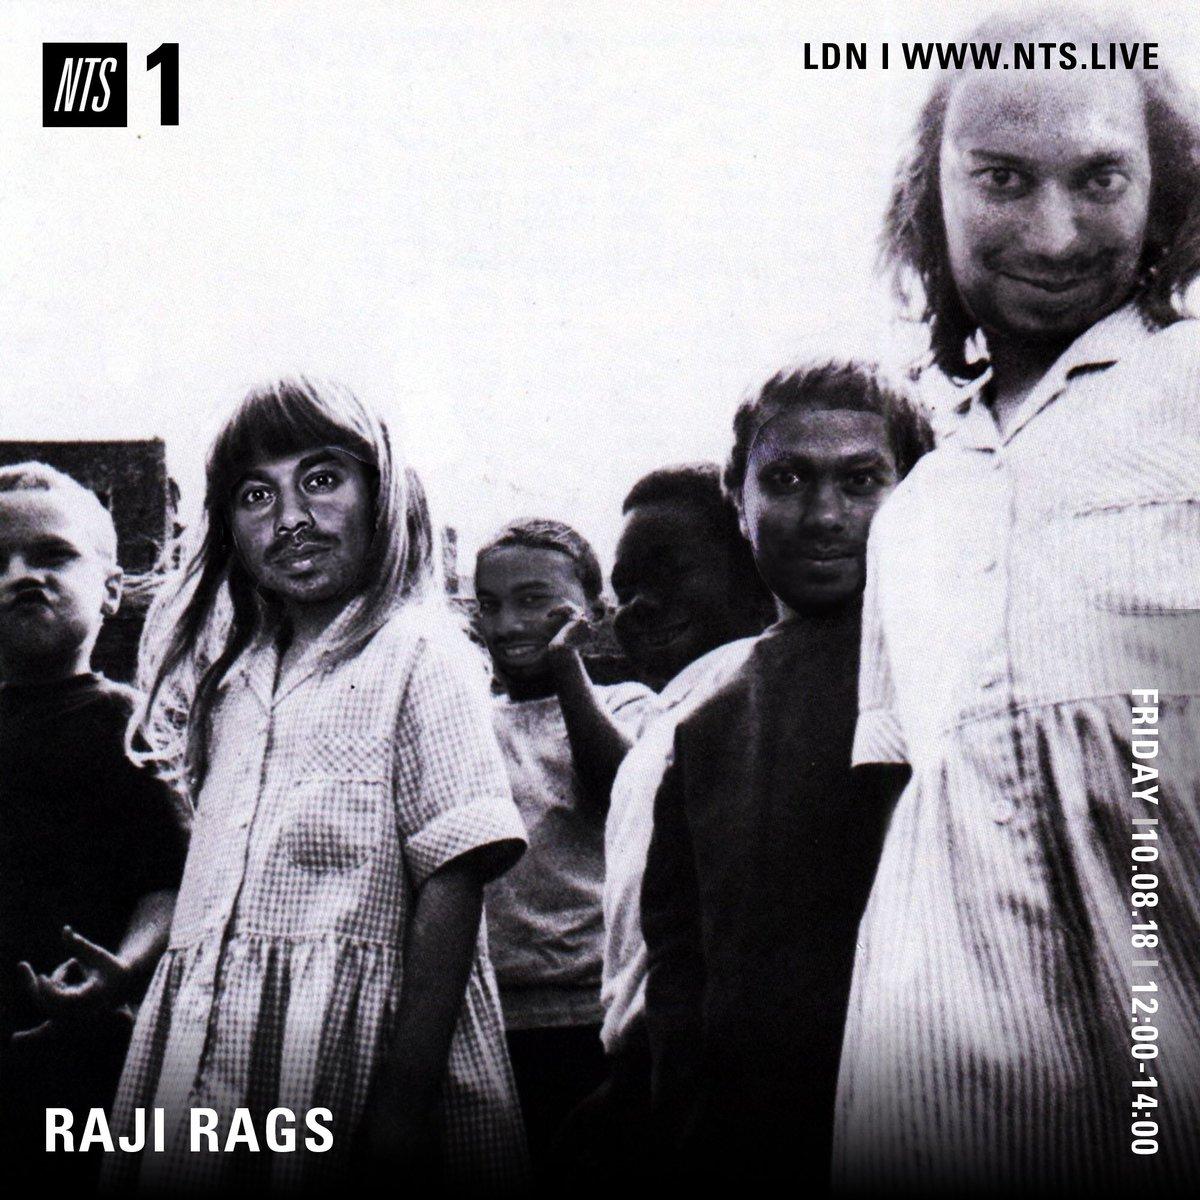 Raj Chaudhuri on Twitter: